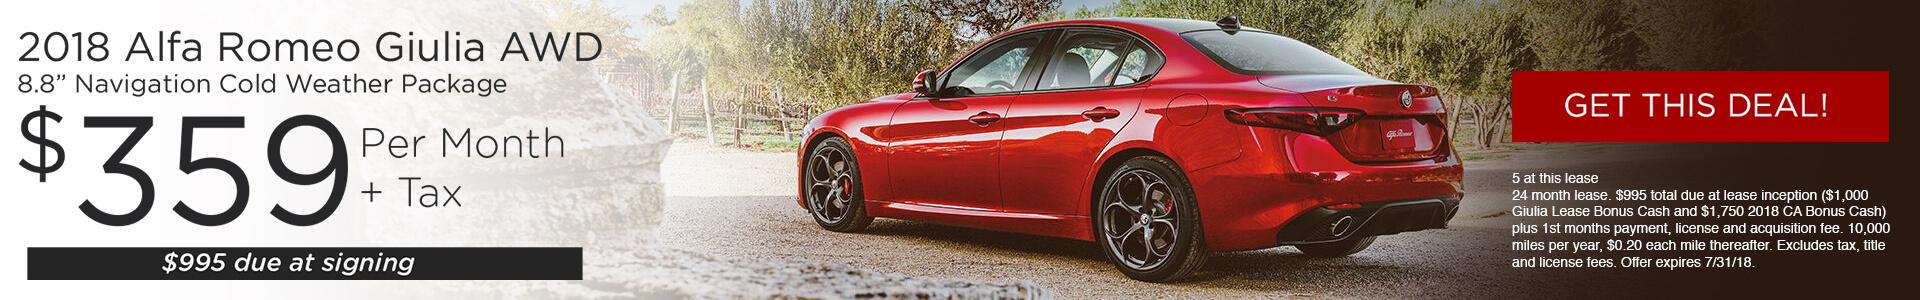 Alfa Romeo Giulia SRP $319